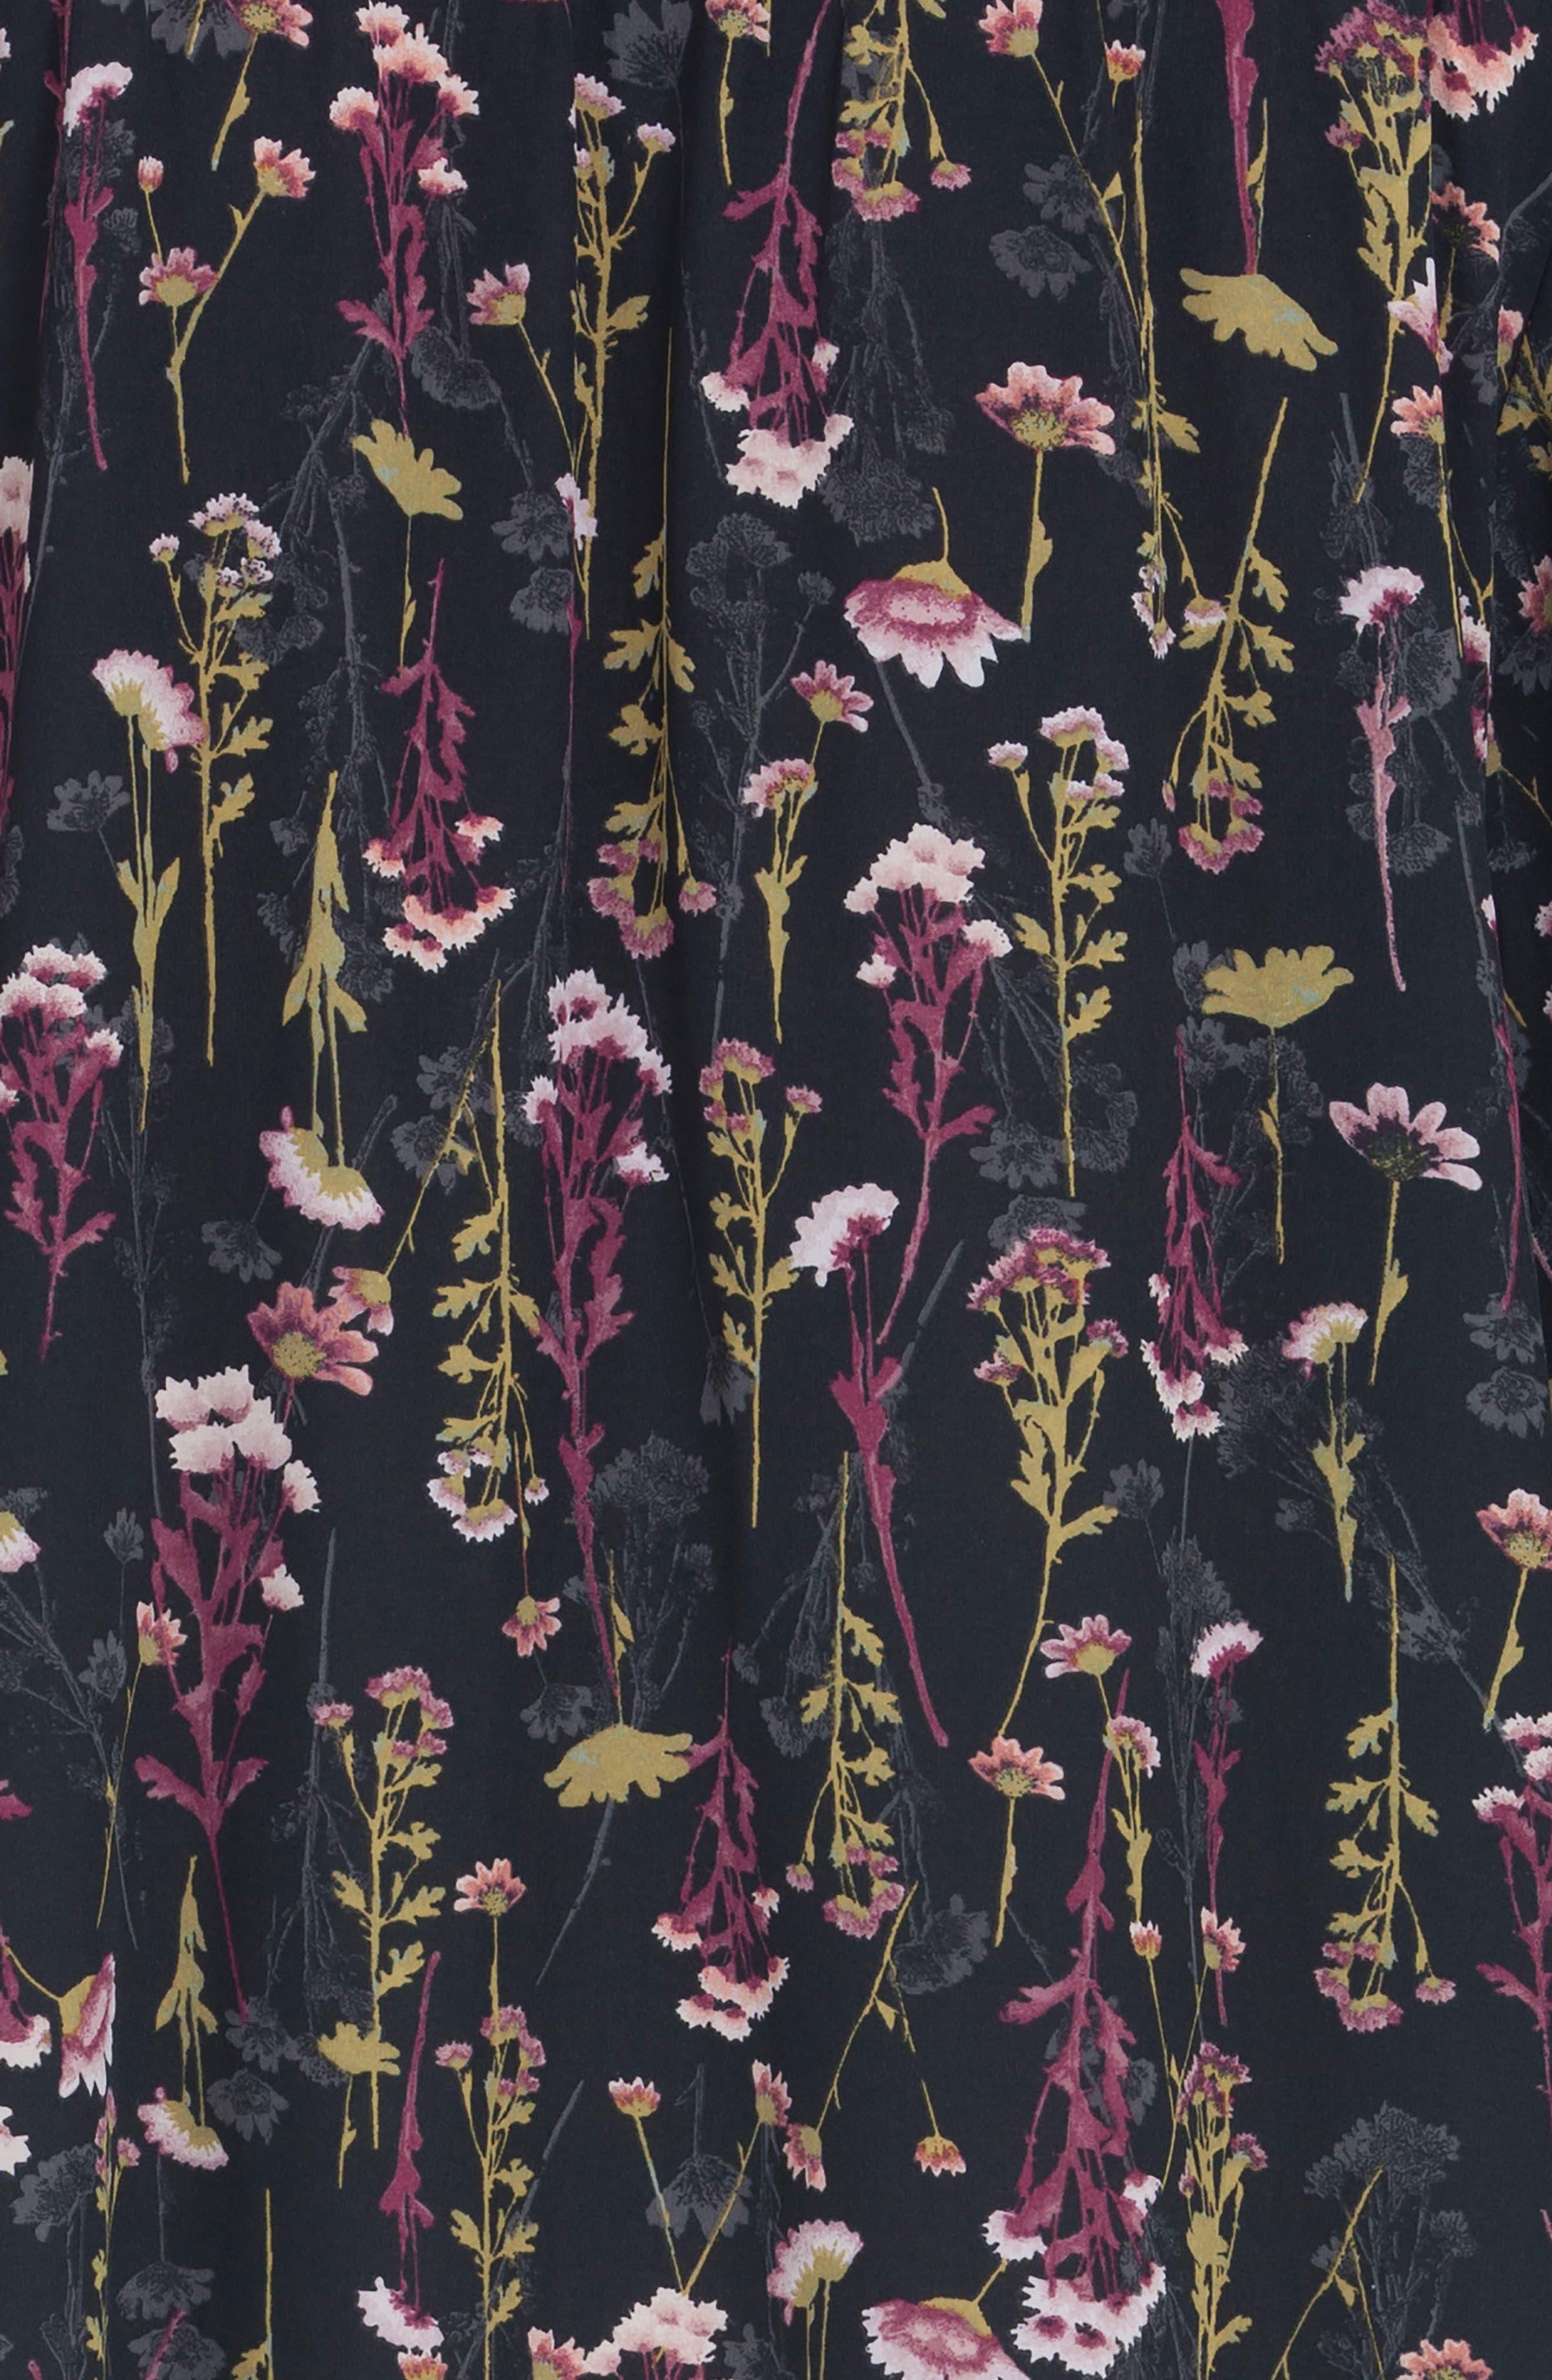 Floral Print Duster,                             Alternate thumbnail 4, color,